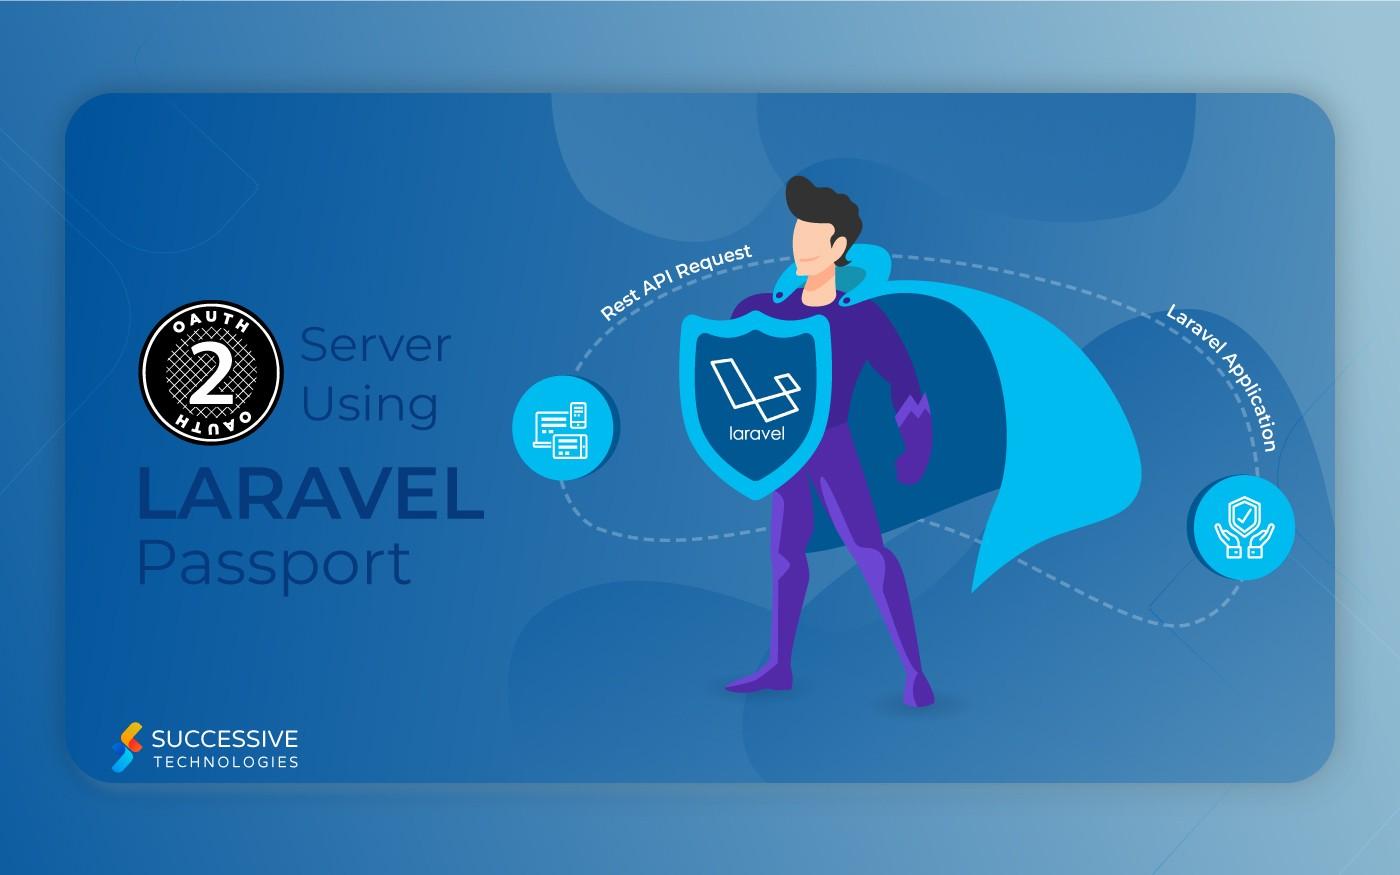 Make an OAuth2 server using Laravel Passport